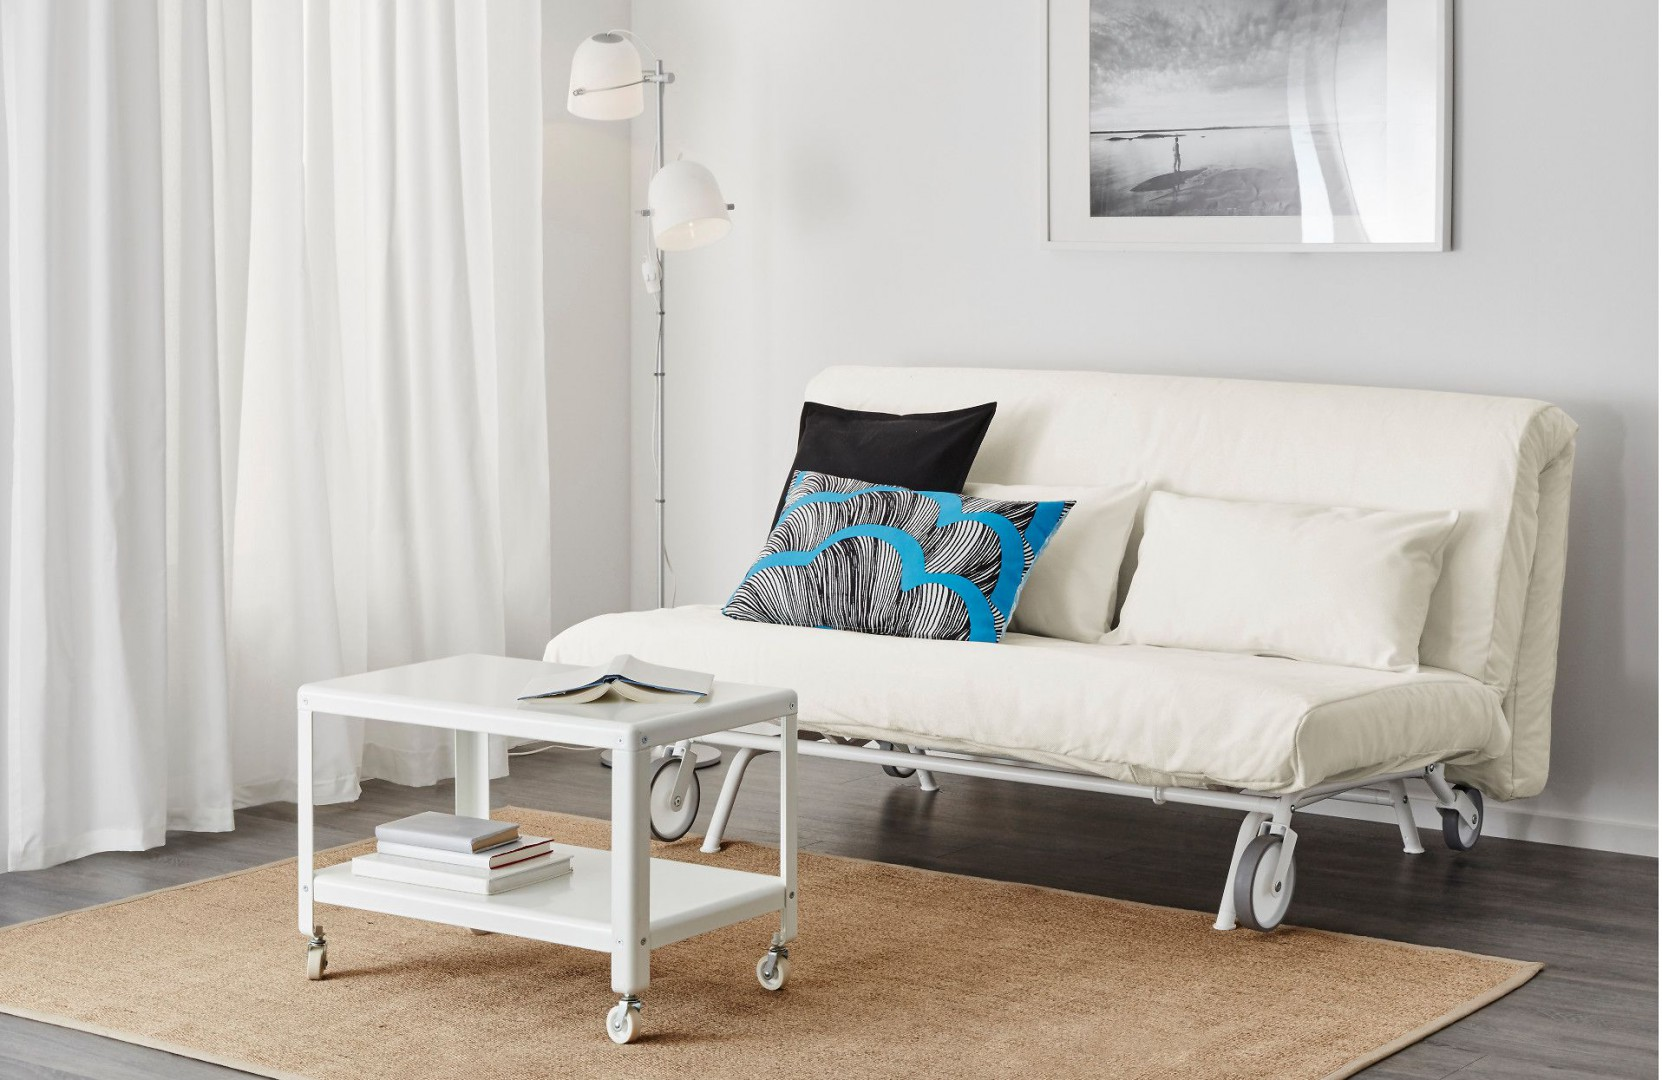 Sofa IKEA PS LÖVÅS. Fot. IKEA